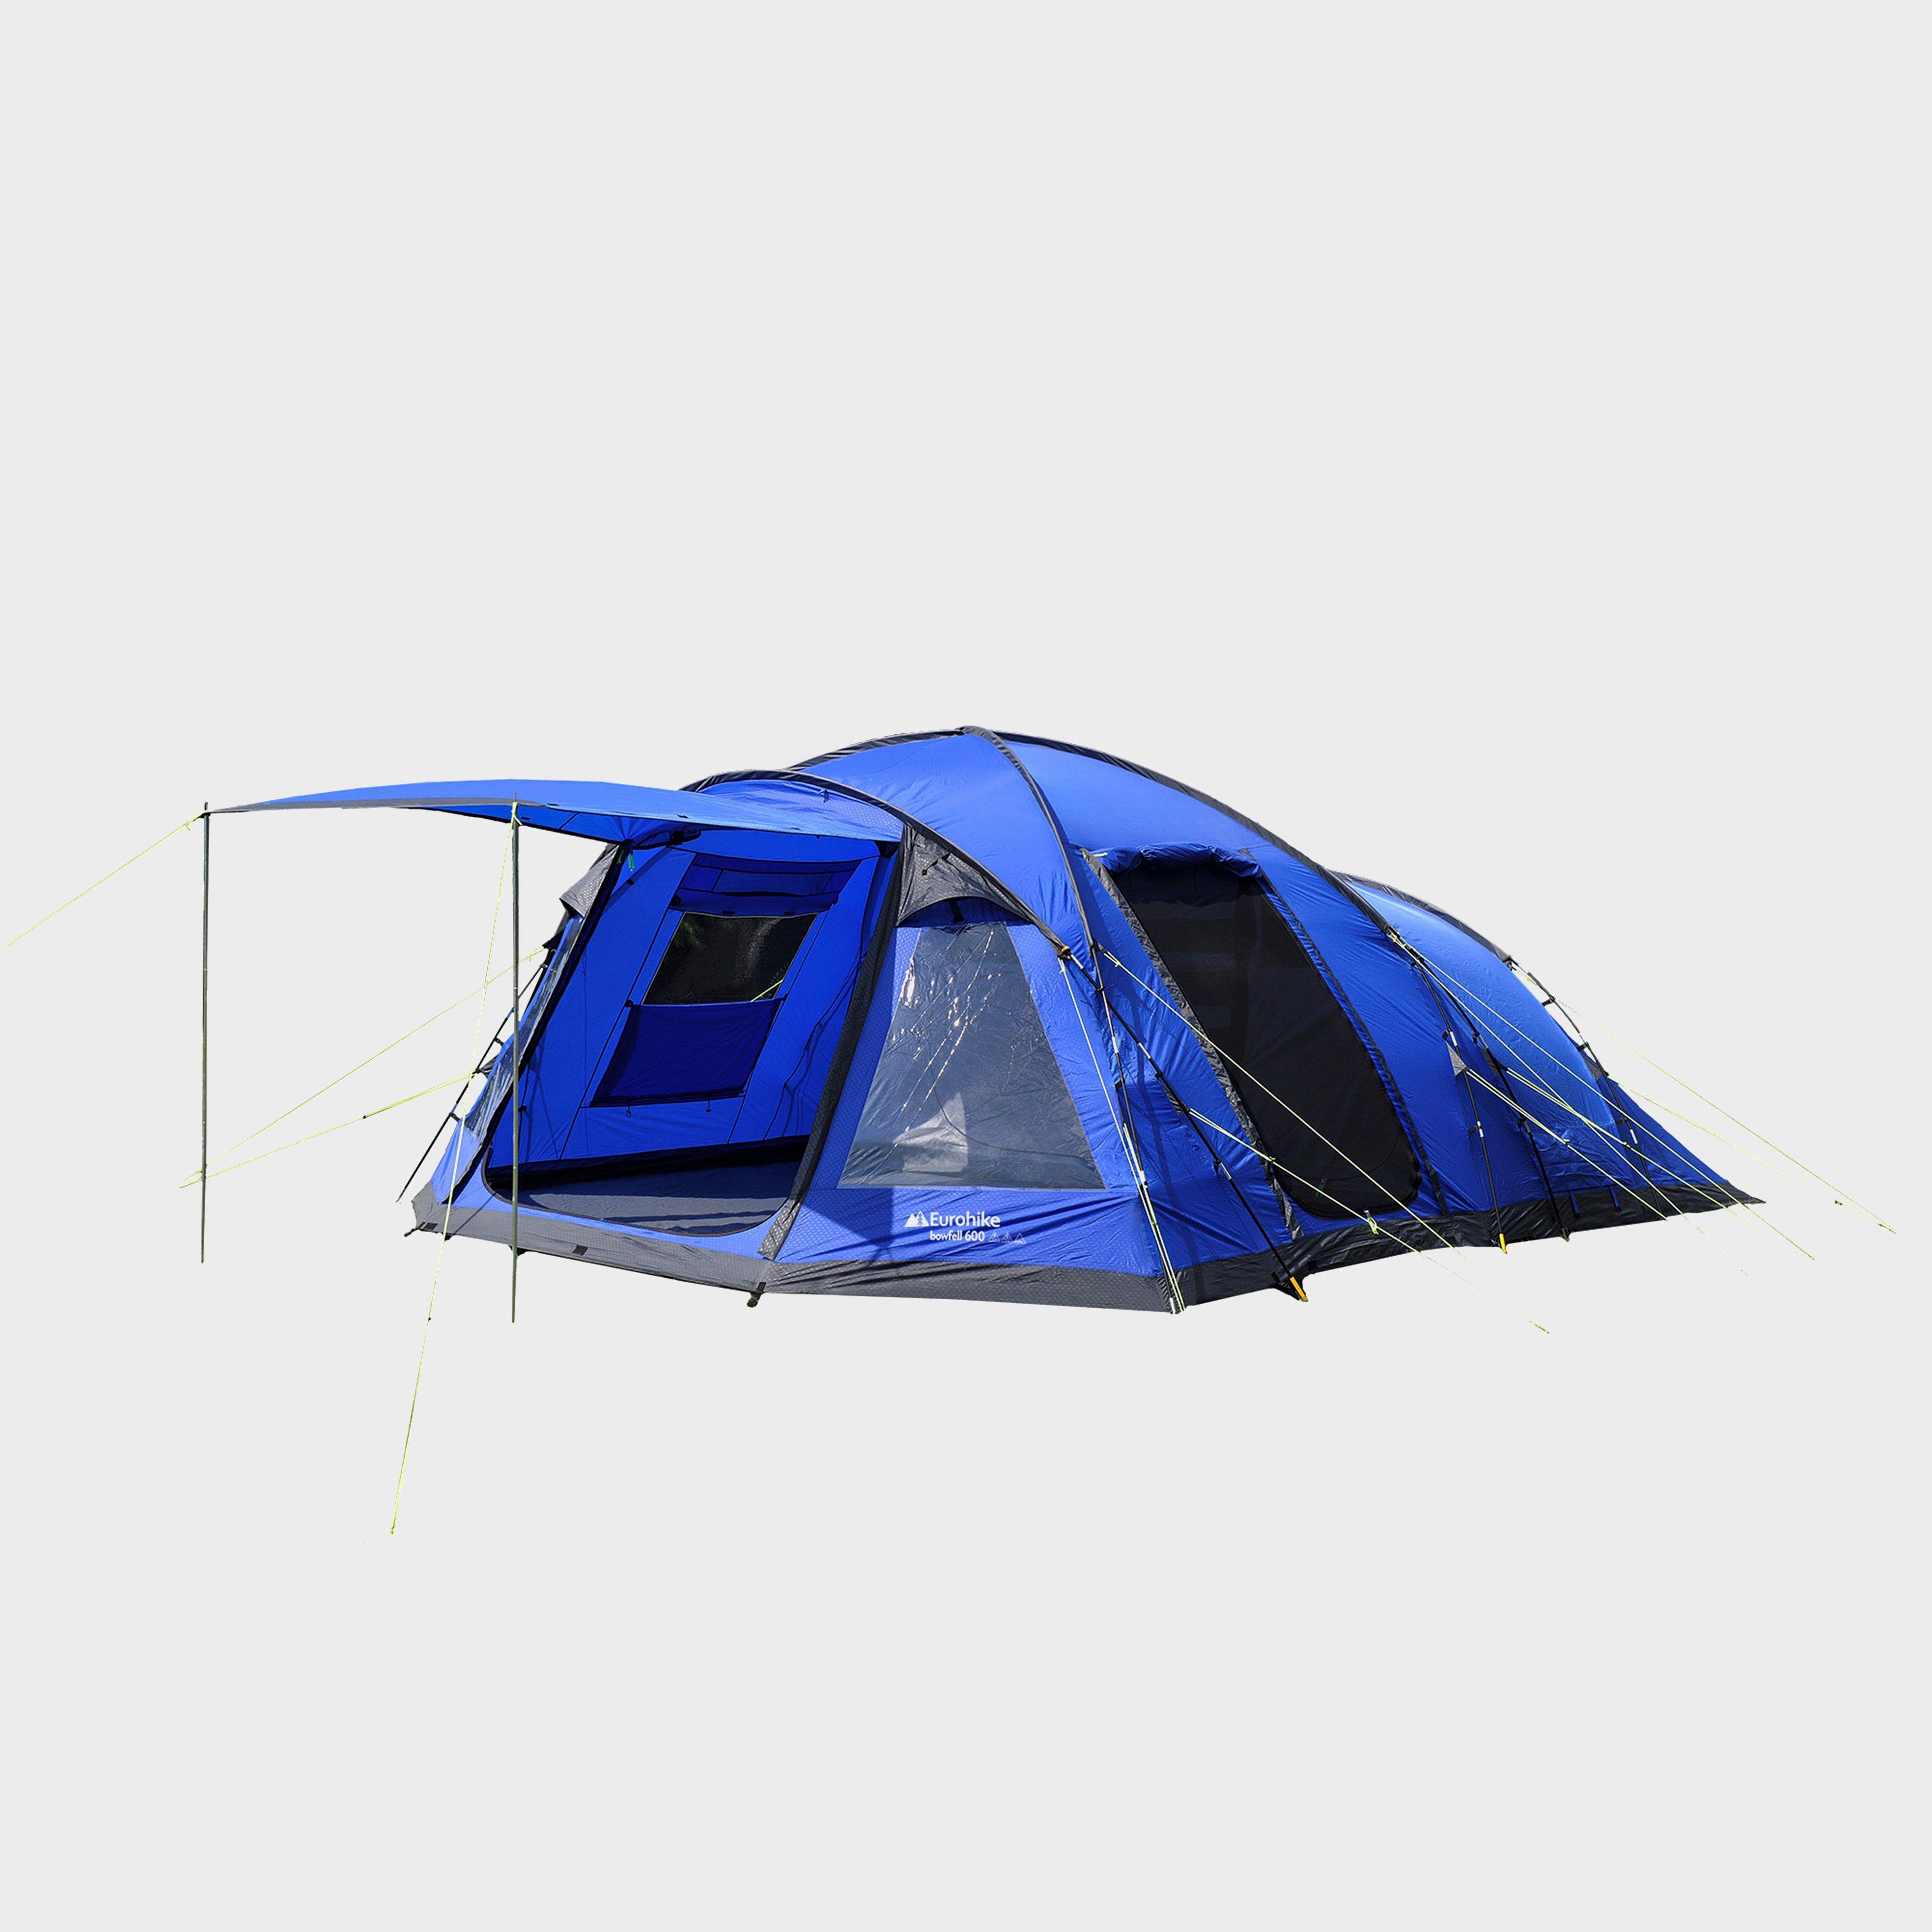 Eurohike Bowfell 600 6 Man Tent & Eurohike Bowfell 600 6 Man Tent | Millet Sports